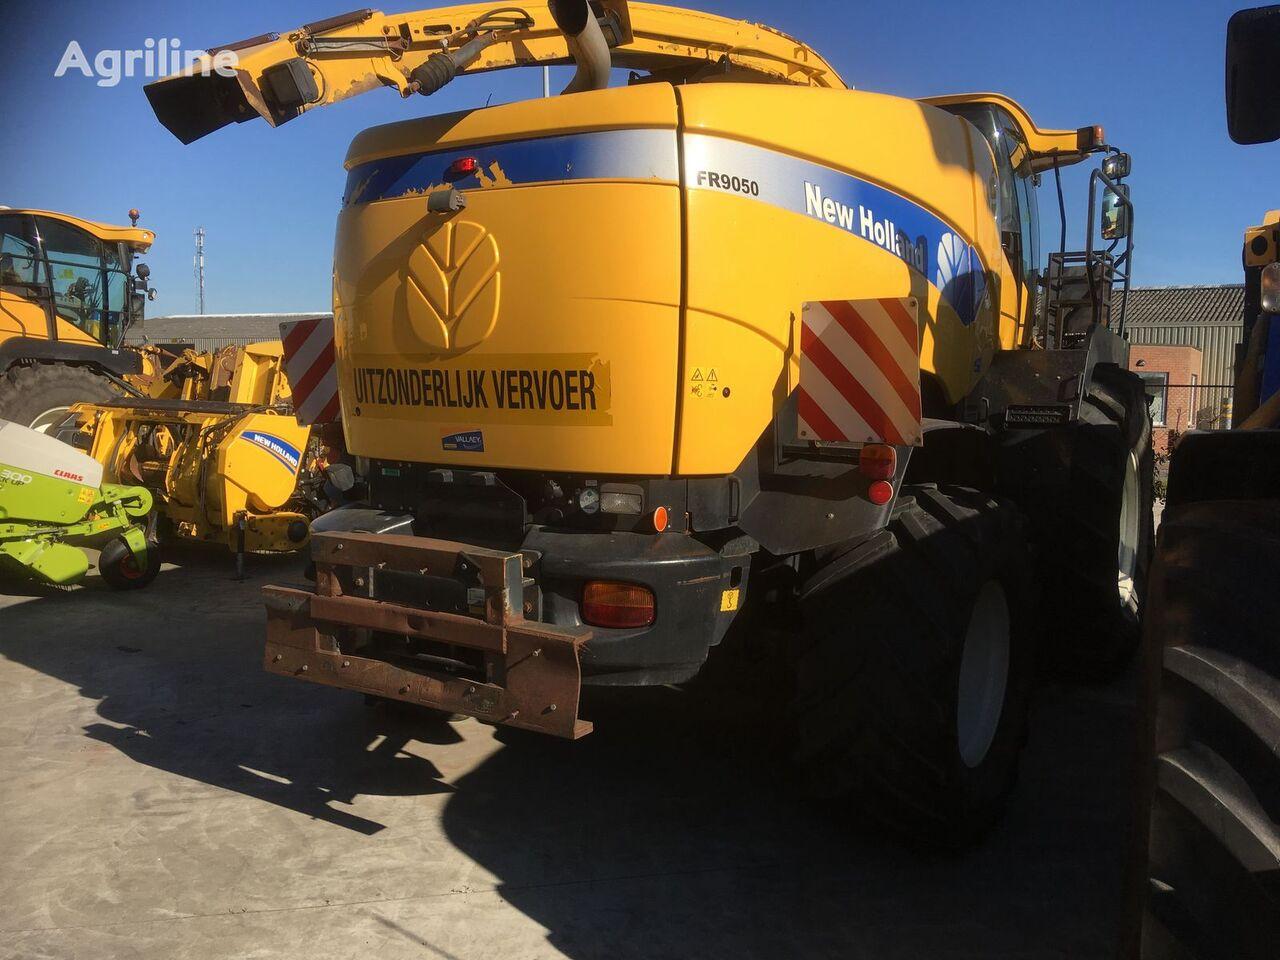 NEW HOLLAND FR9050 cosechadora de forraje